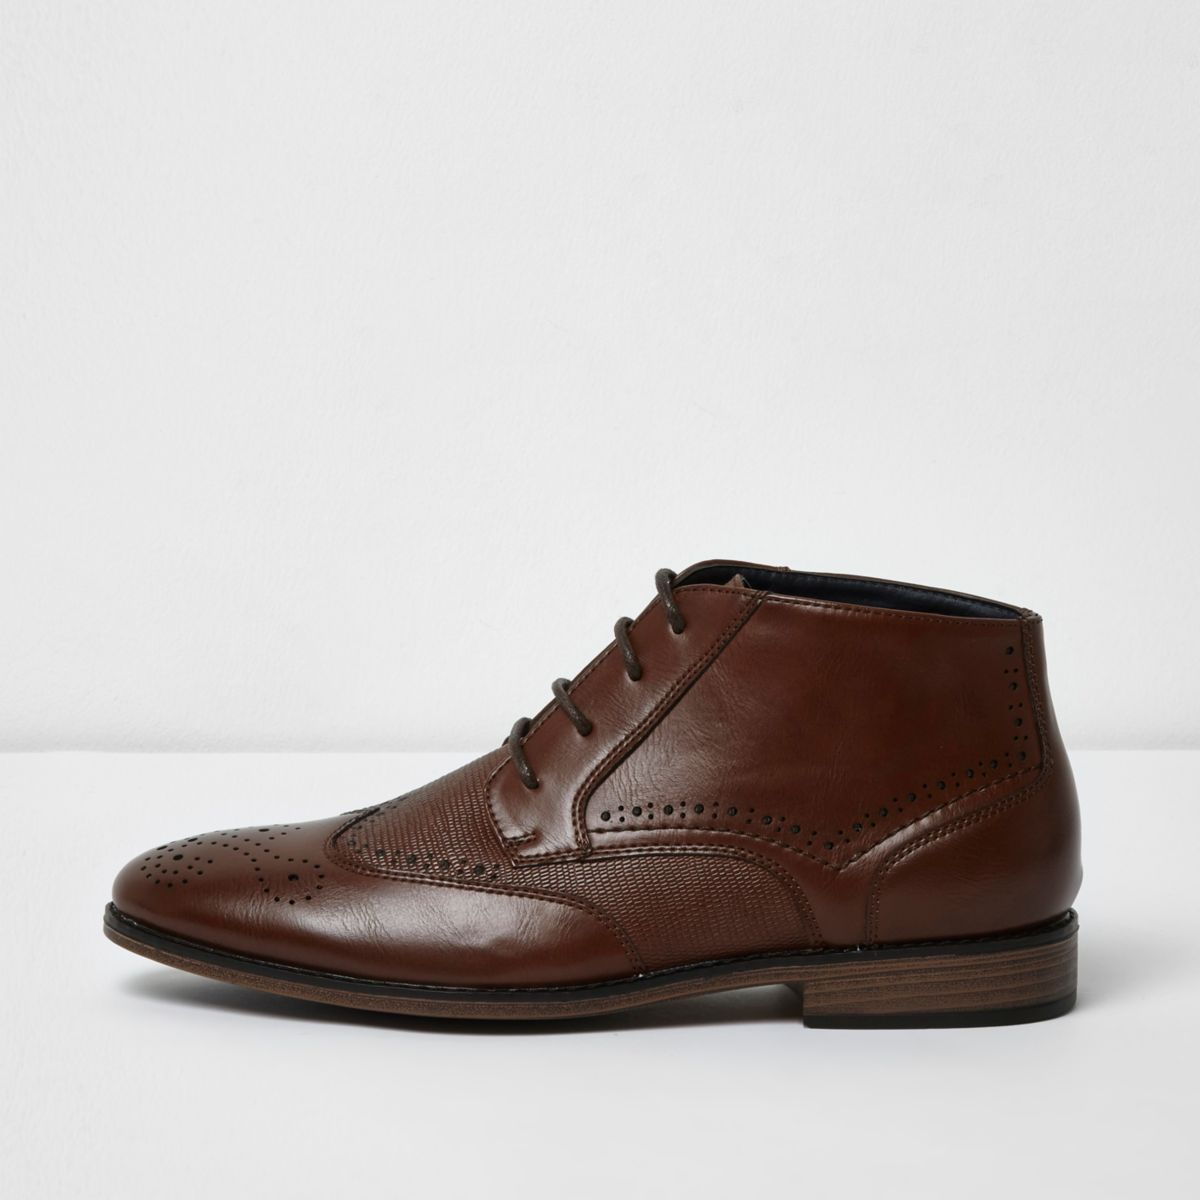 Brown textured brogue boots